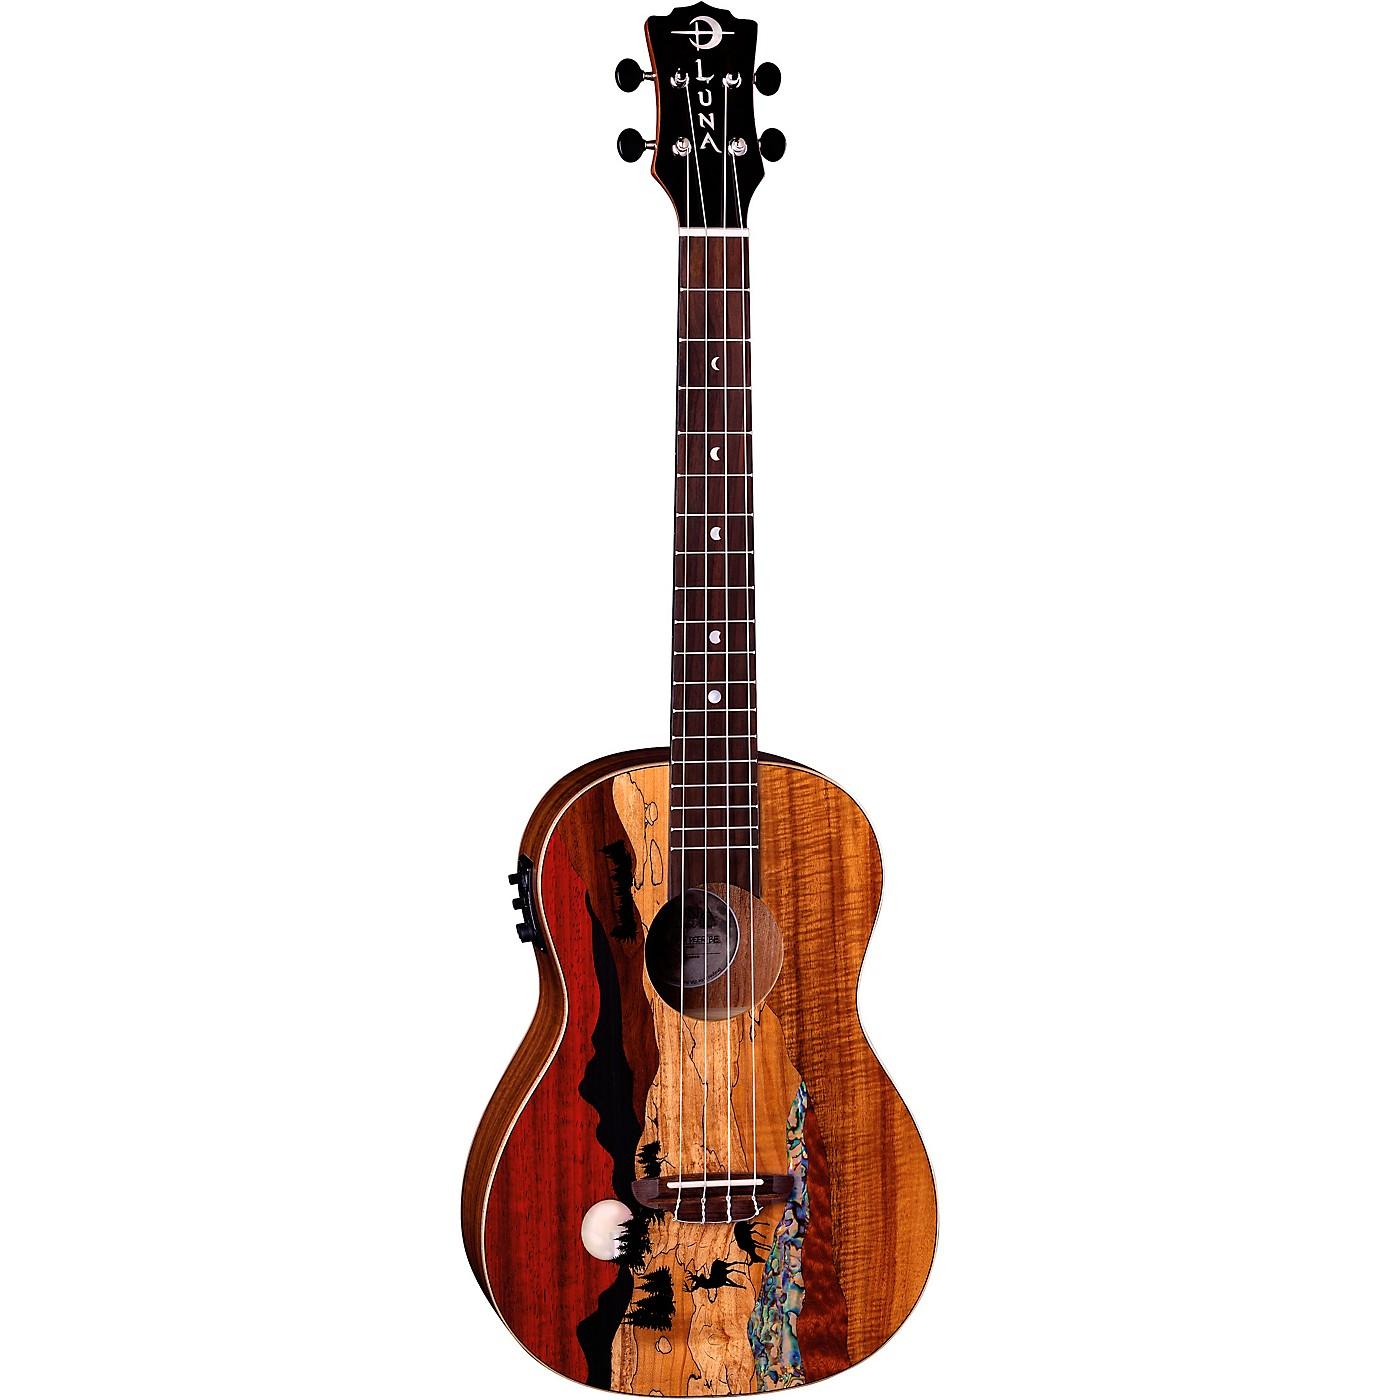 Luna Guitars Vista Deer Baritone Acoustic-Electric Ukulele thumbnail